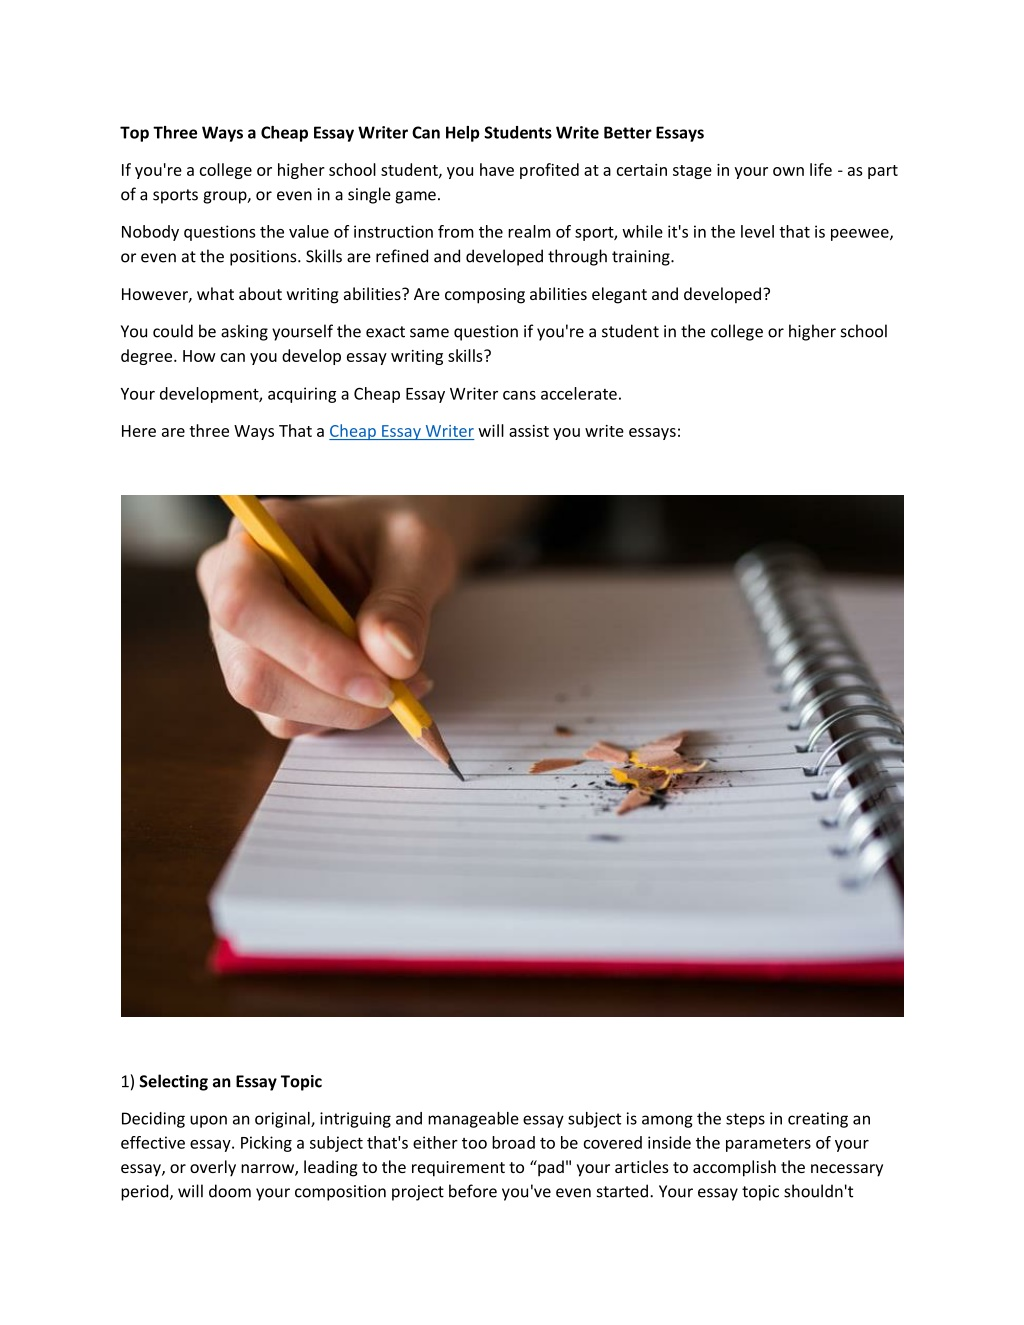 Top school cheap essay topics an example of a summary essay